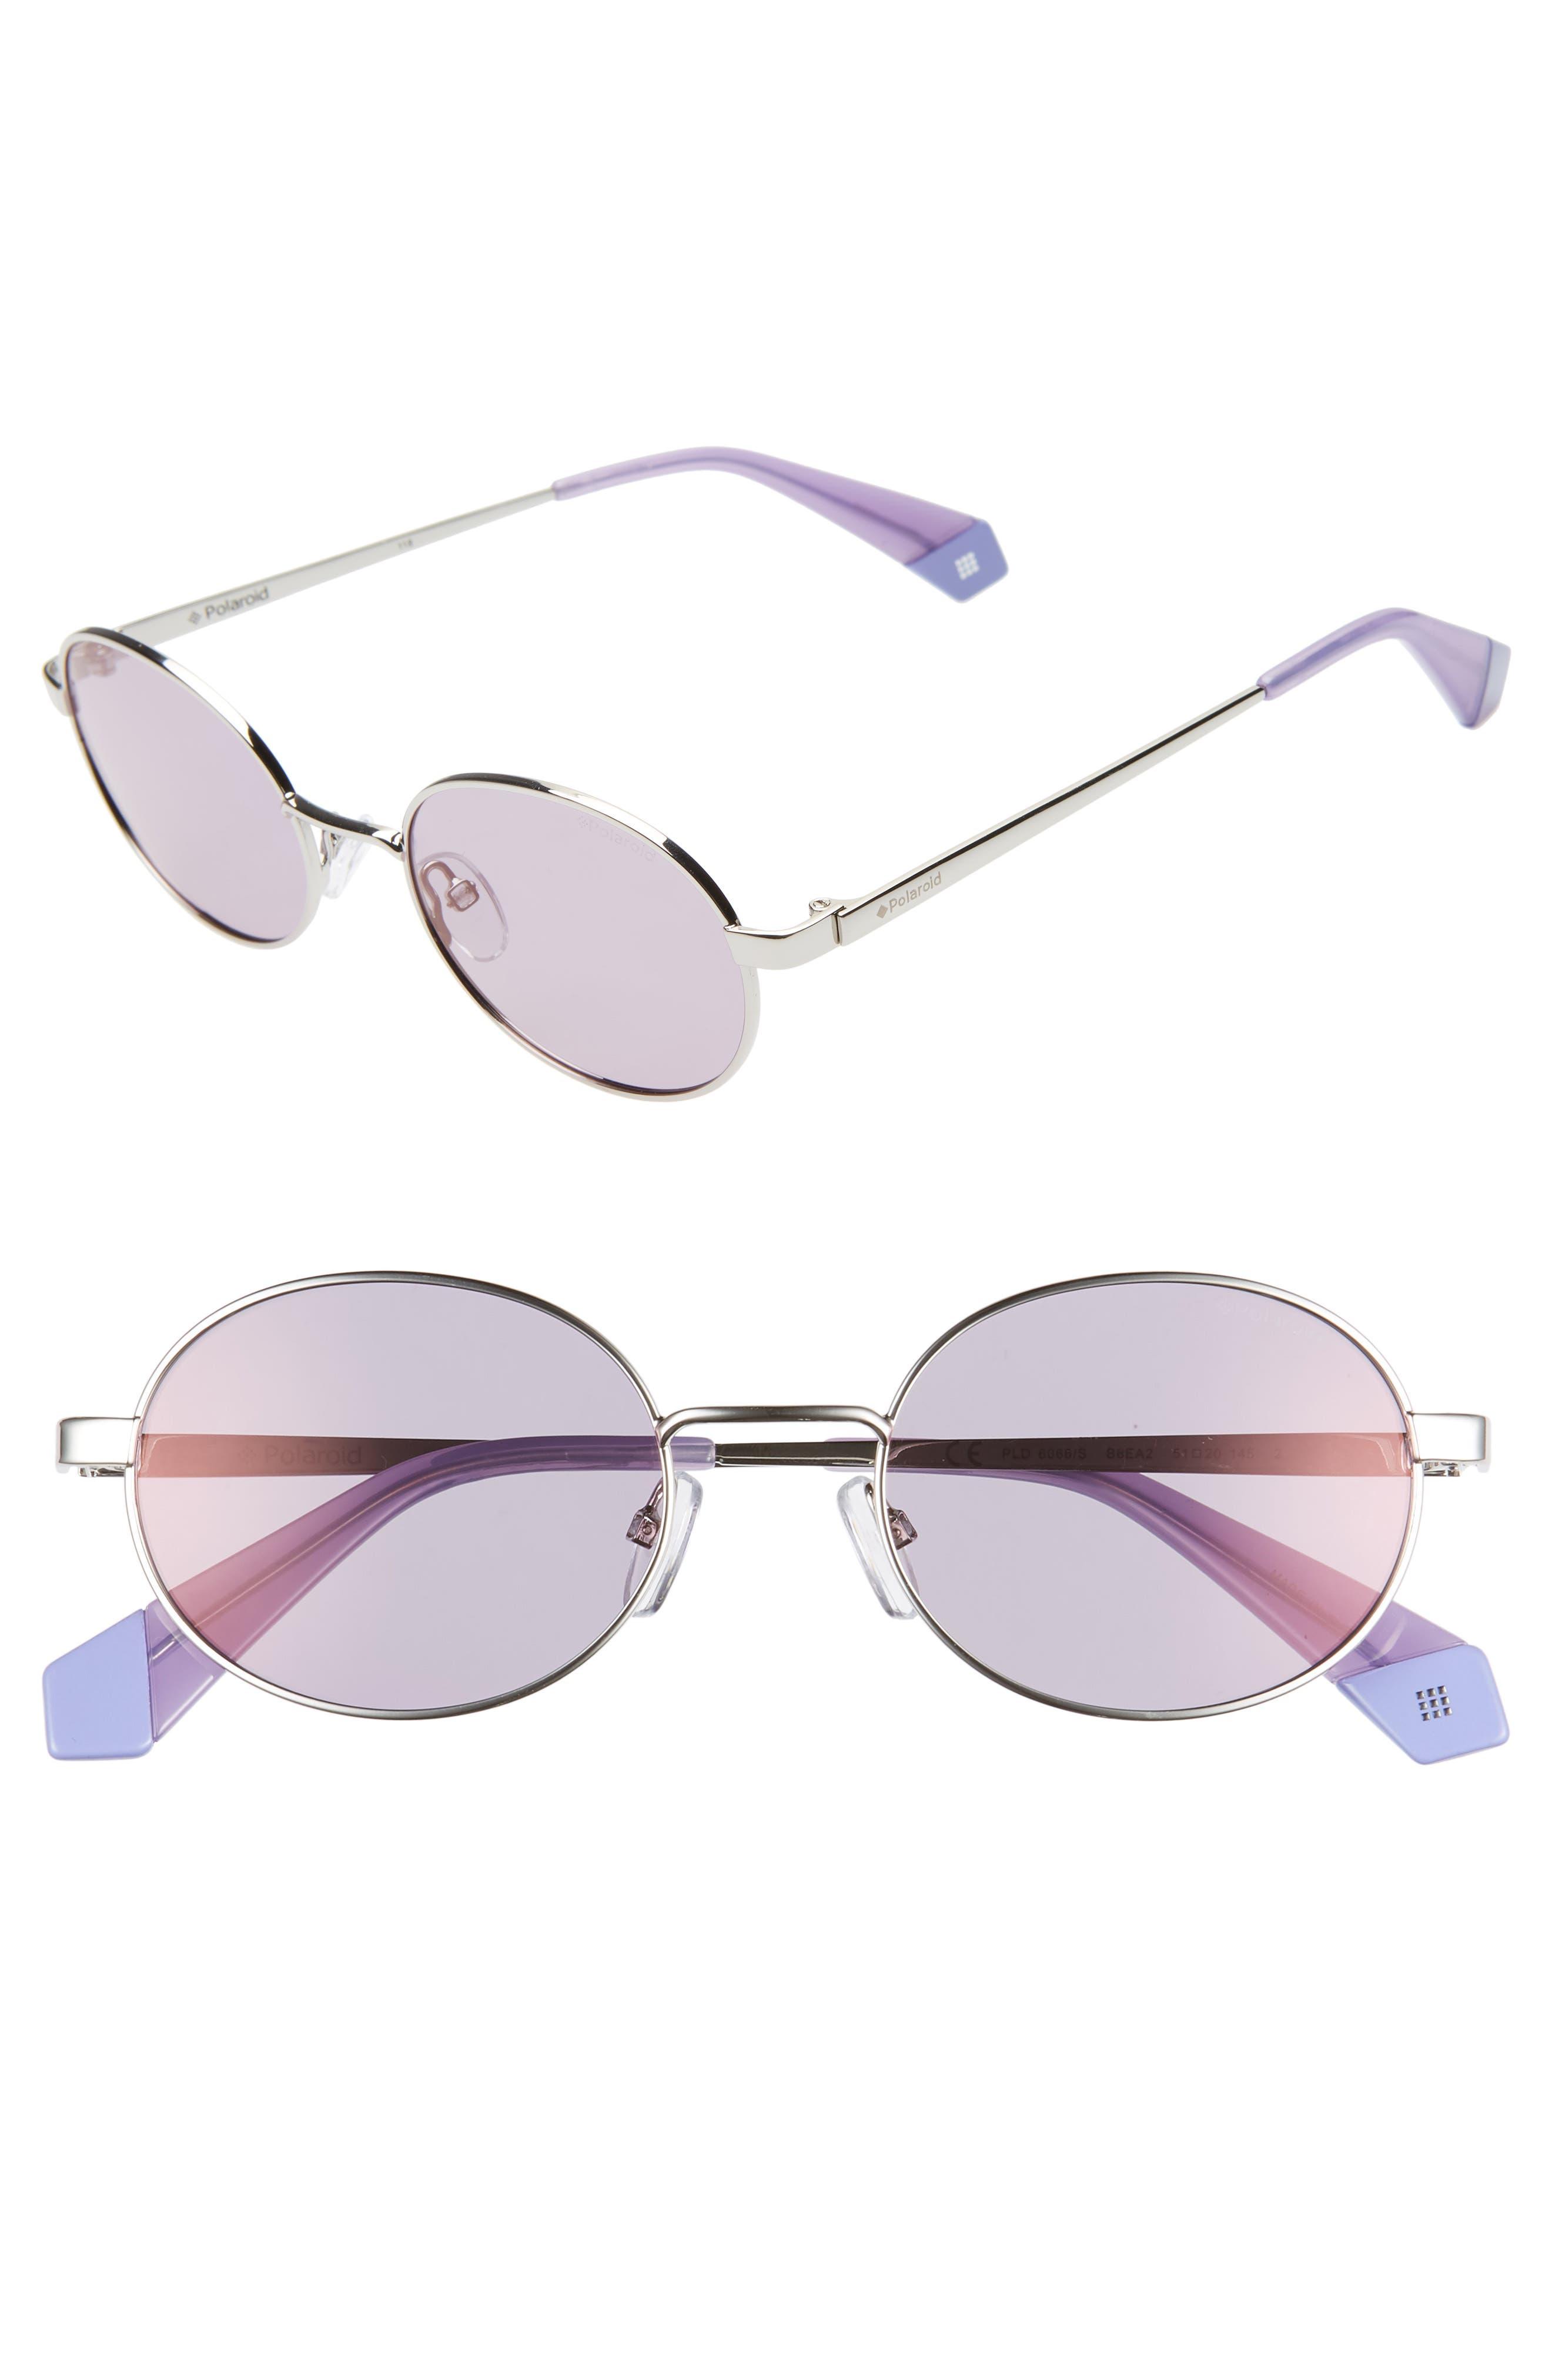 Polaroid 51Mm Polarized Round Sunglasses - Silver/ Lilac